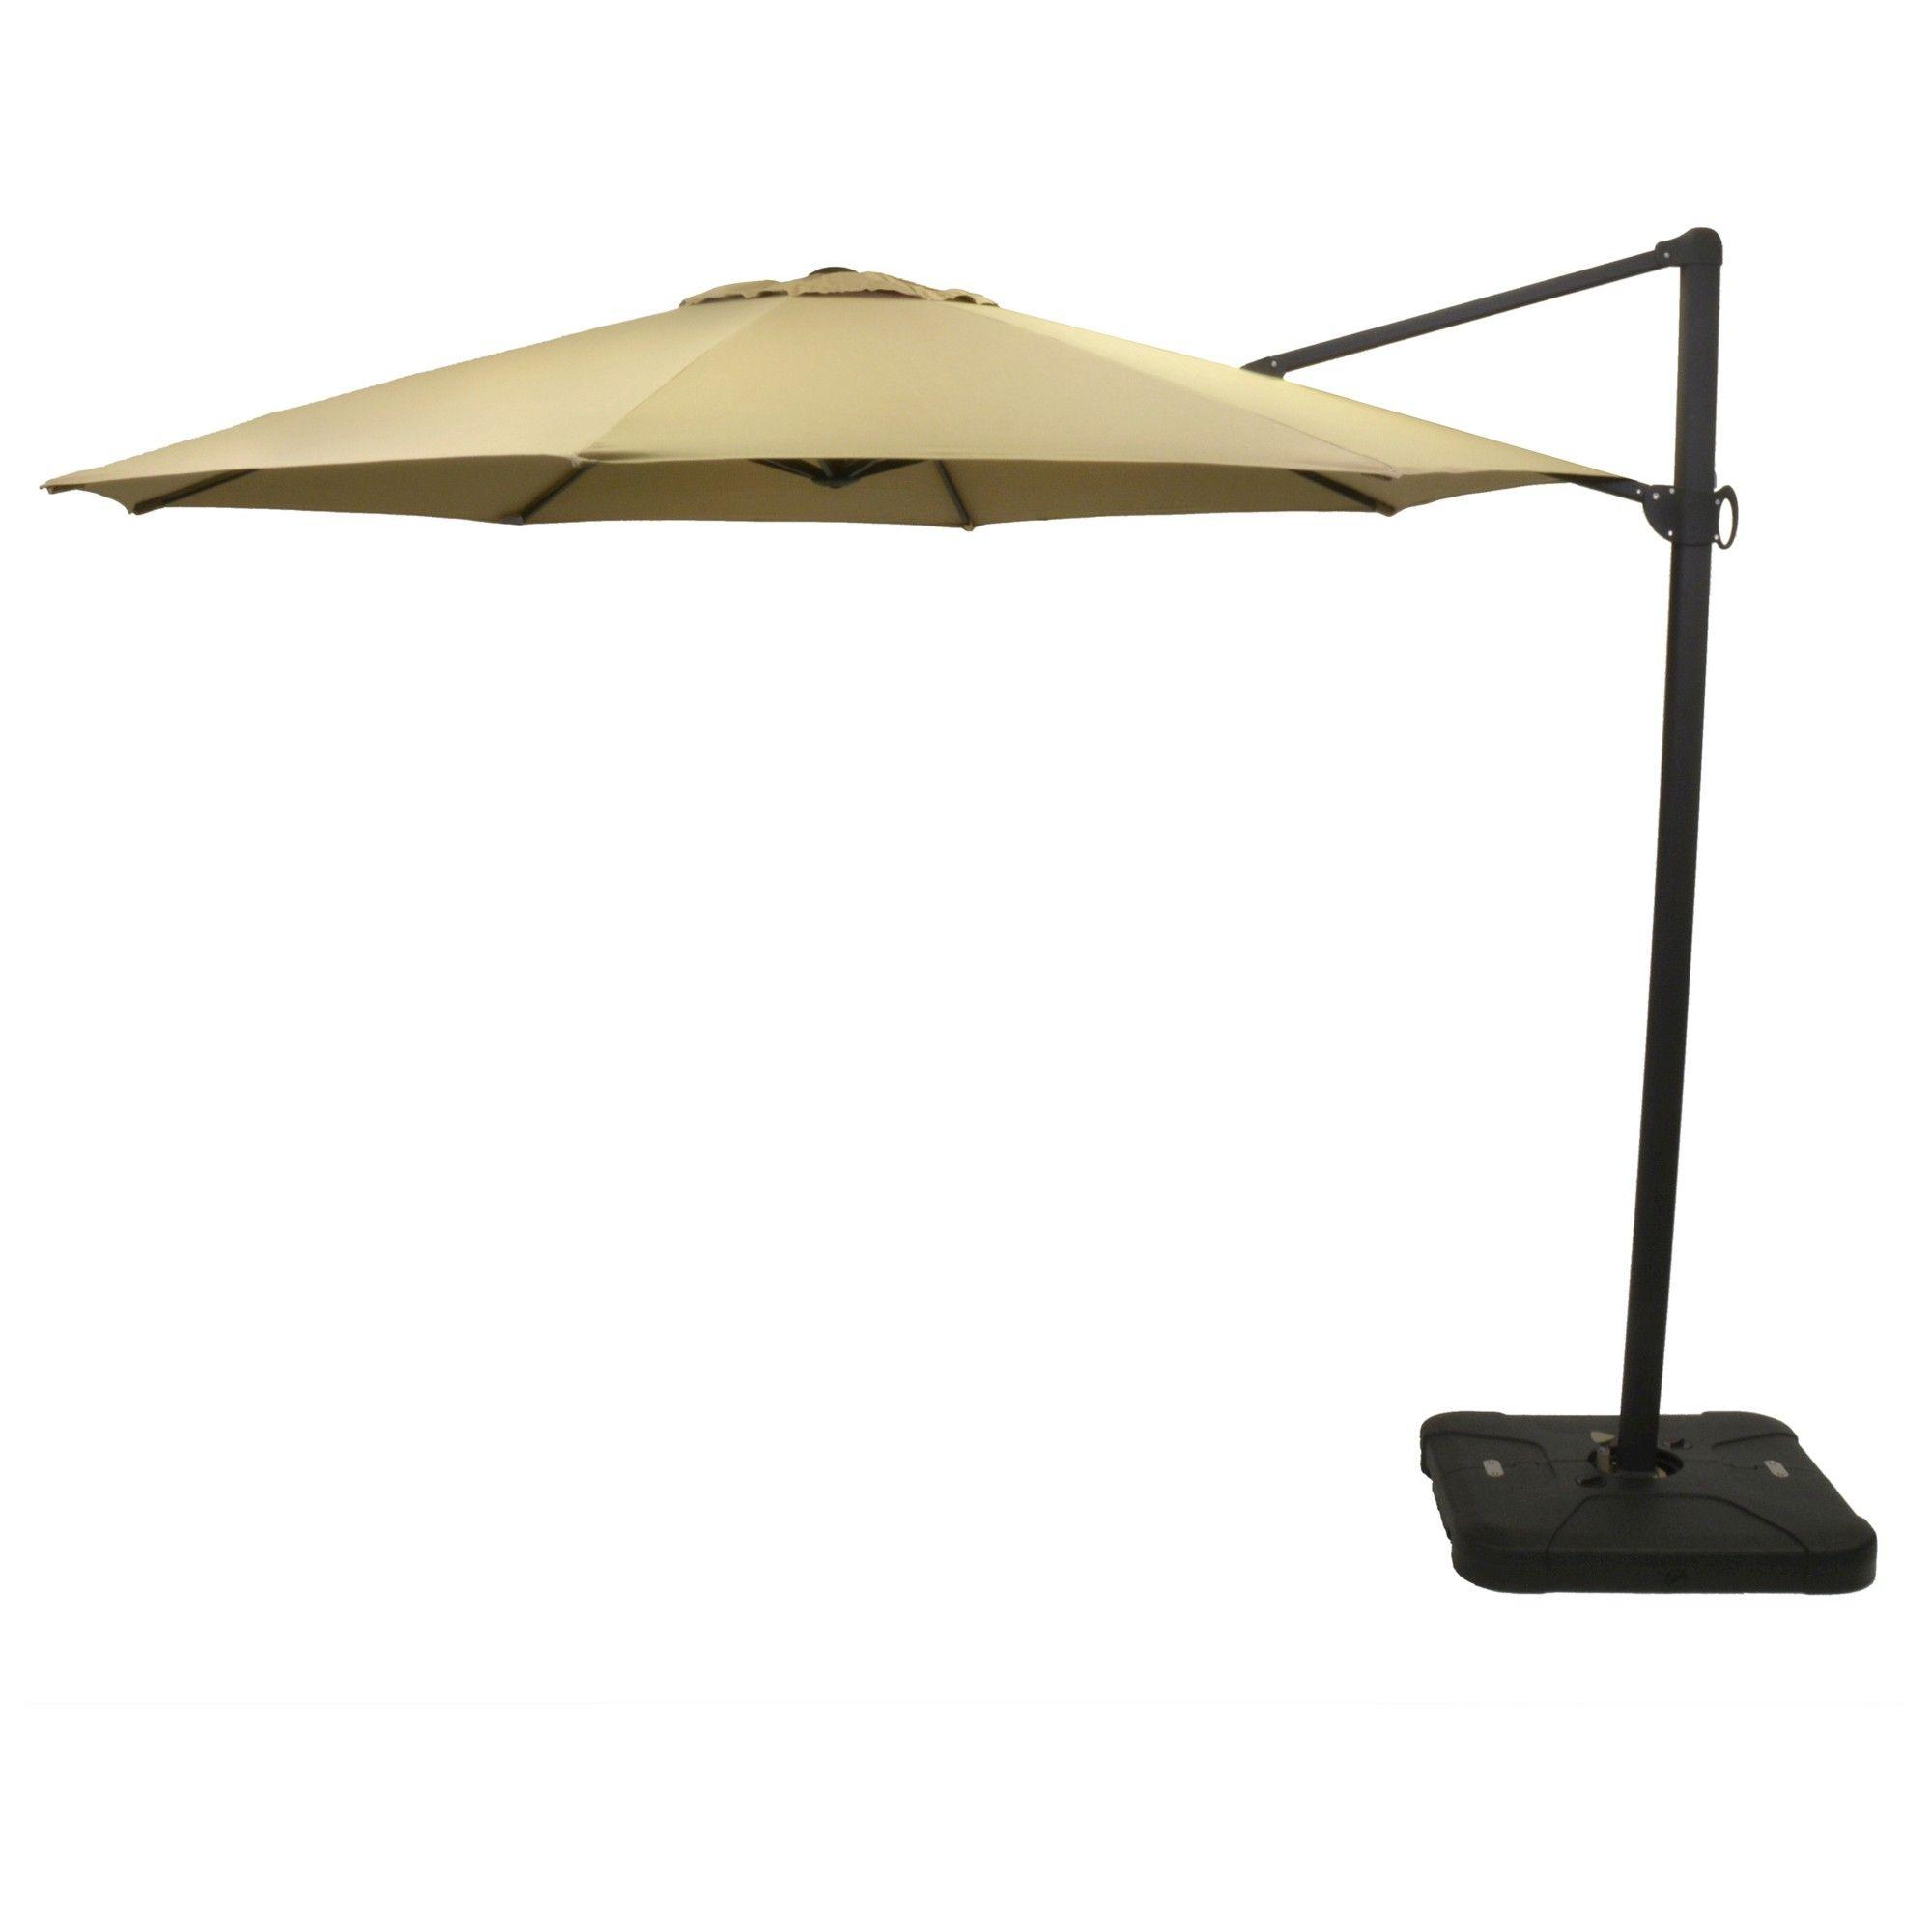 11' Offset Sunbrella Umbrella - Canvas Heather Beige - Black